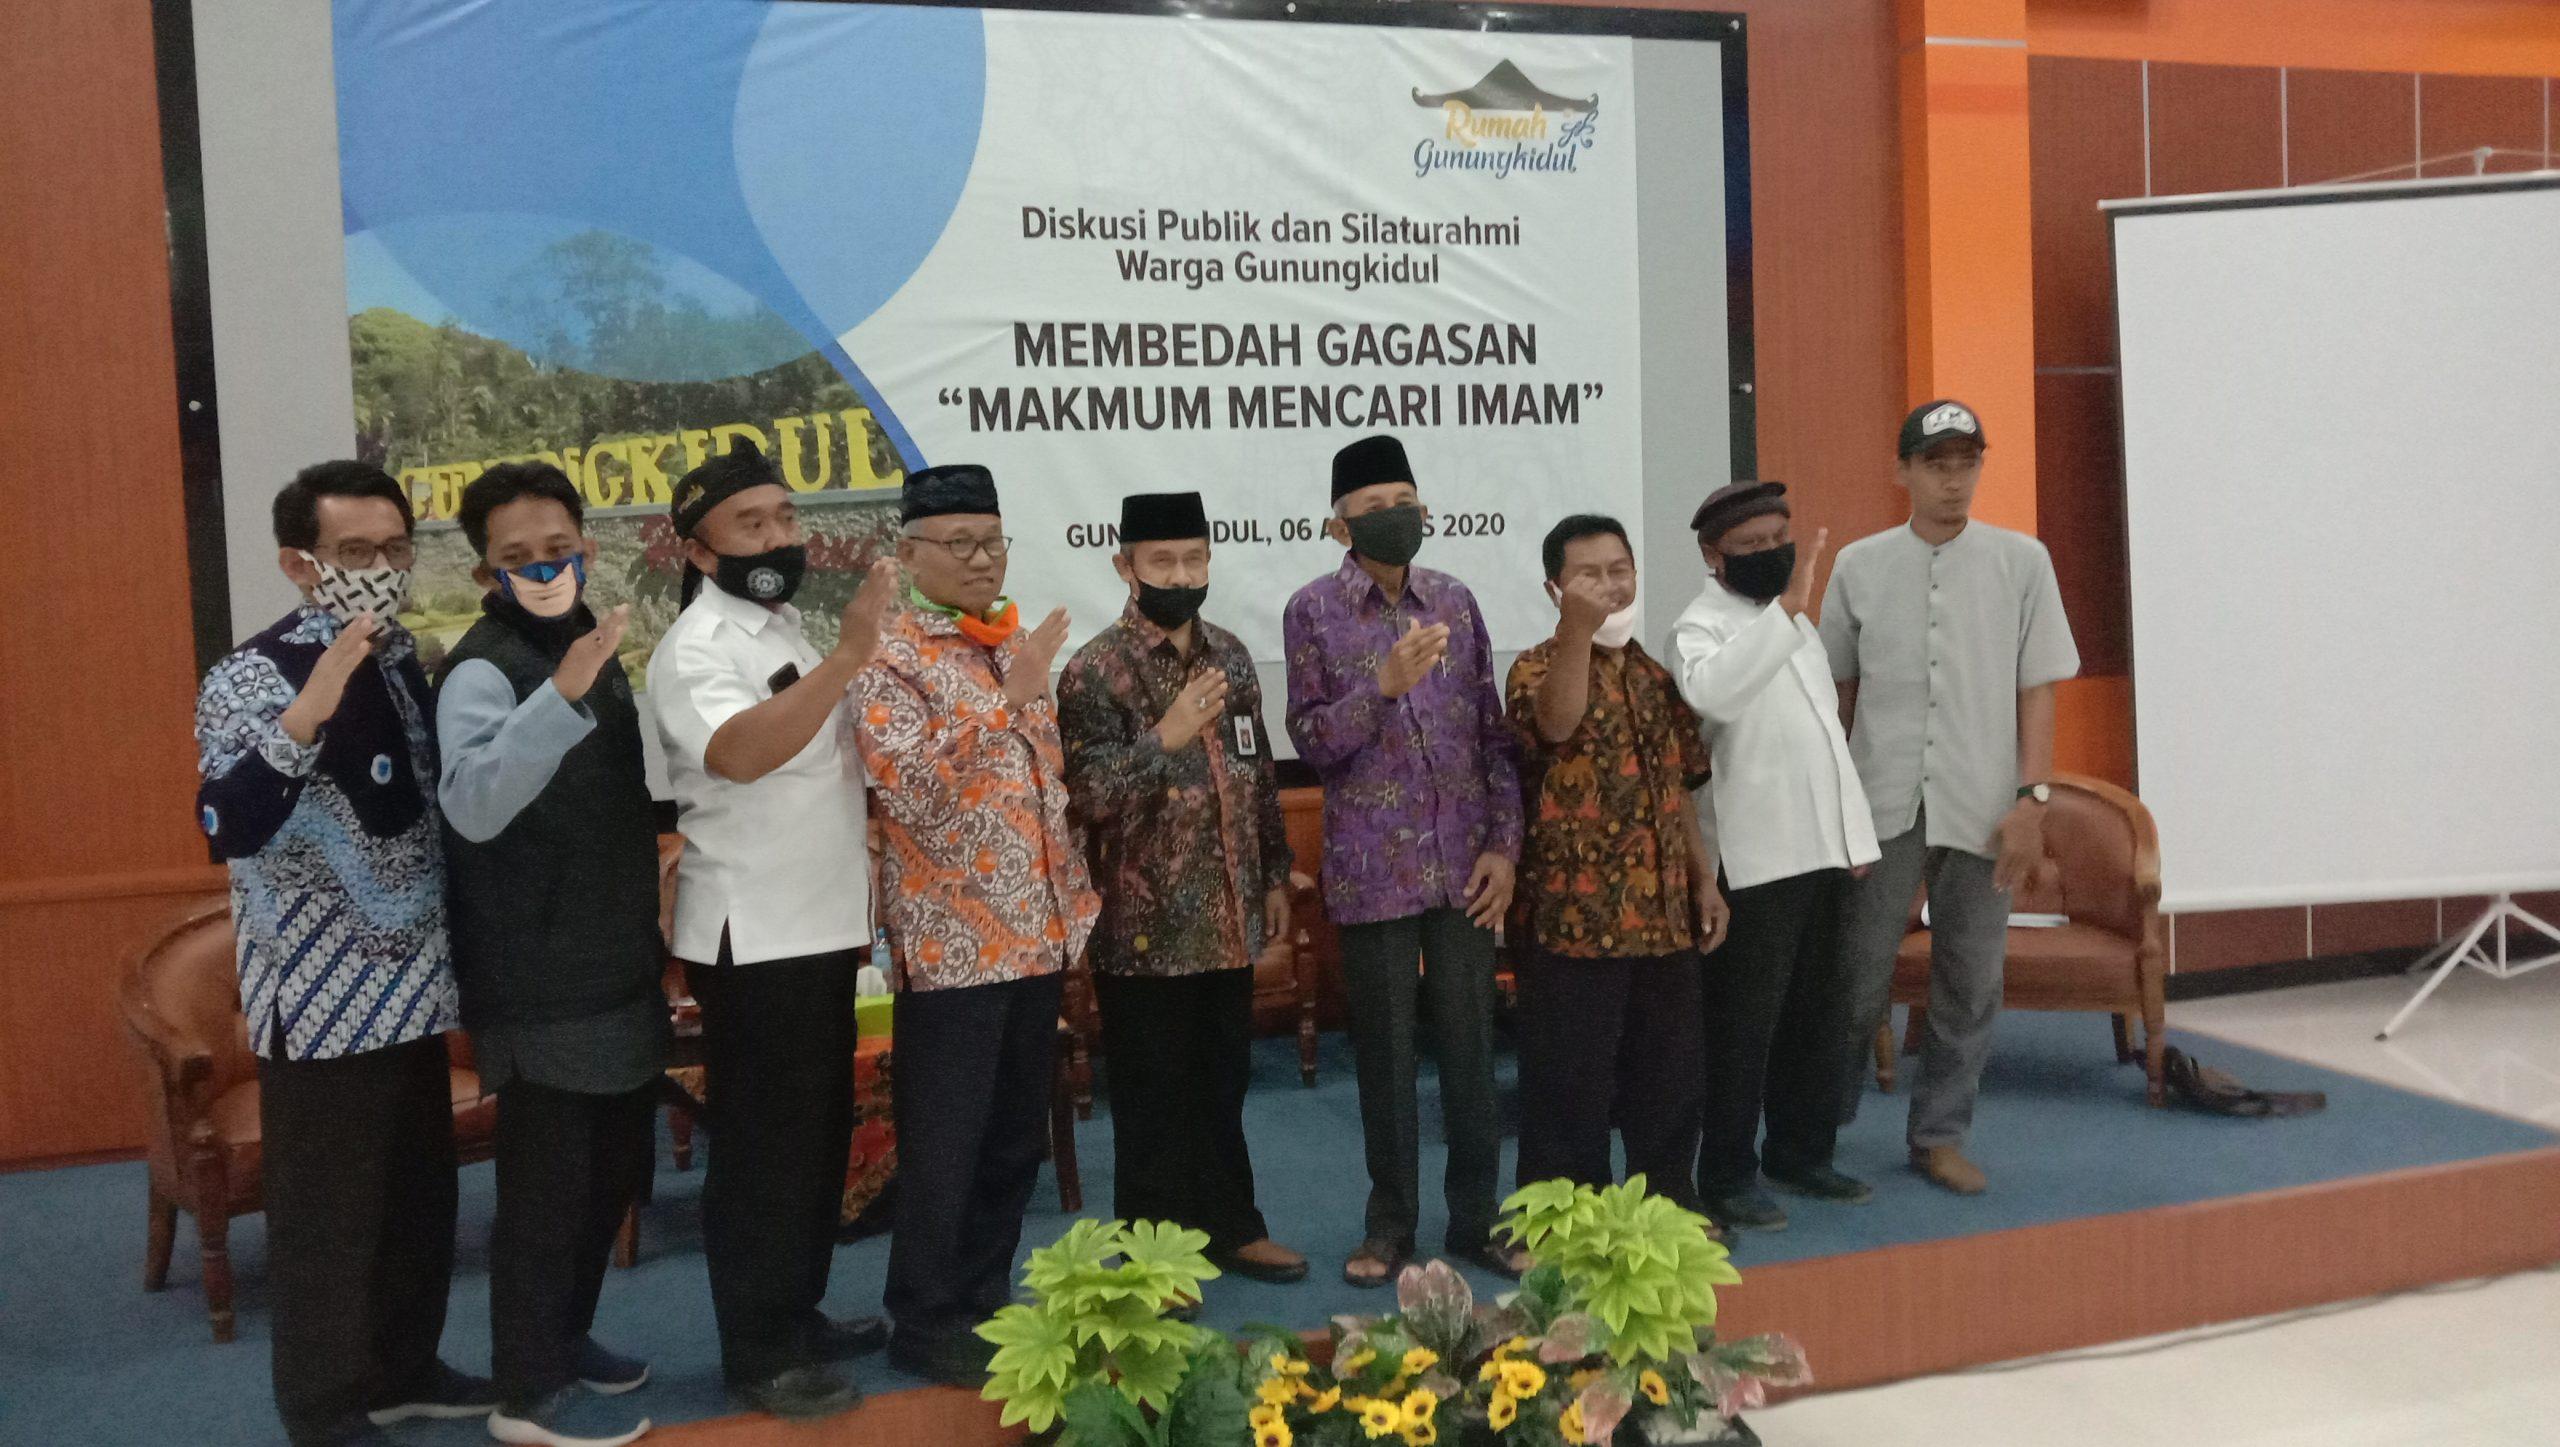 "[caption id=""attachment_78"" align=""alignnone"" width=""1024""] Membedah Gagasan Makmum Mencari Imam[/caption]"